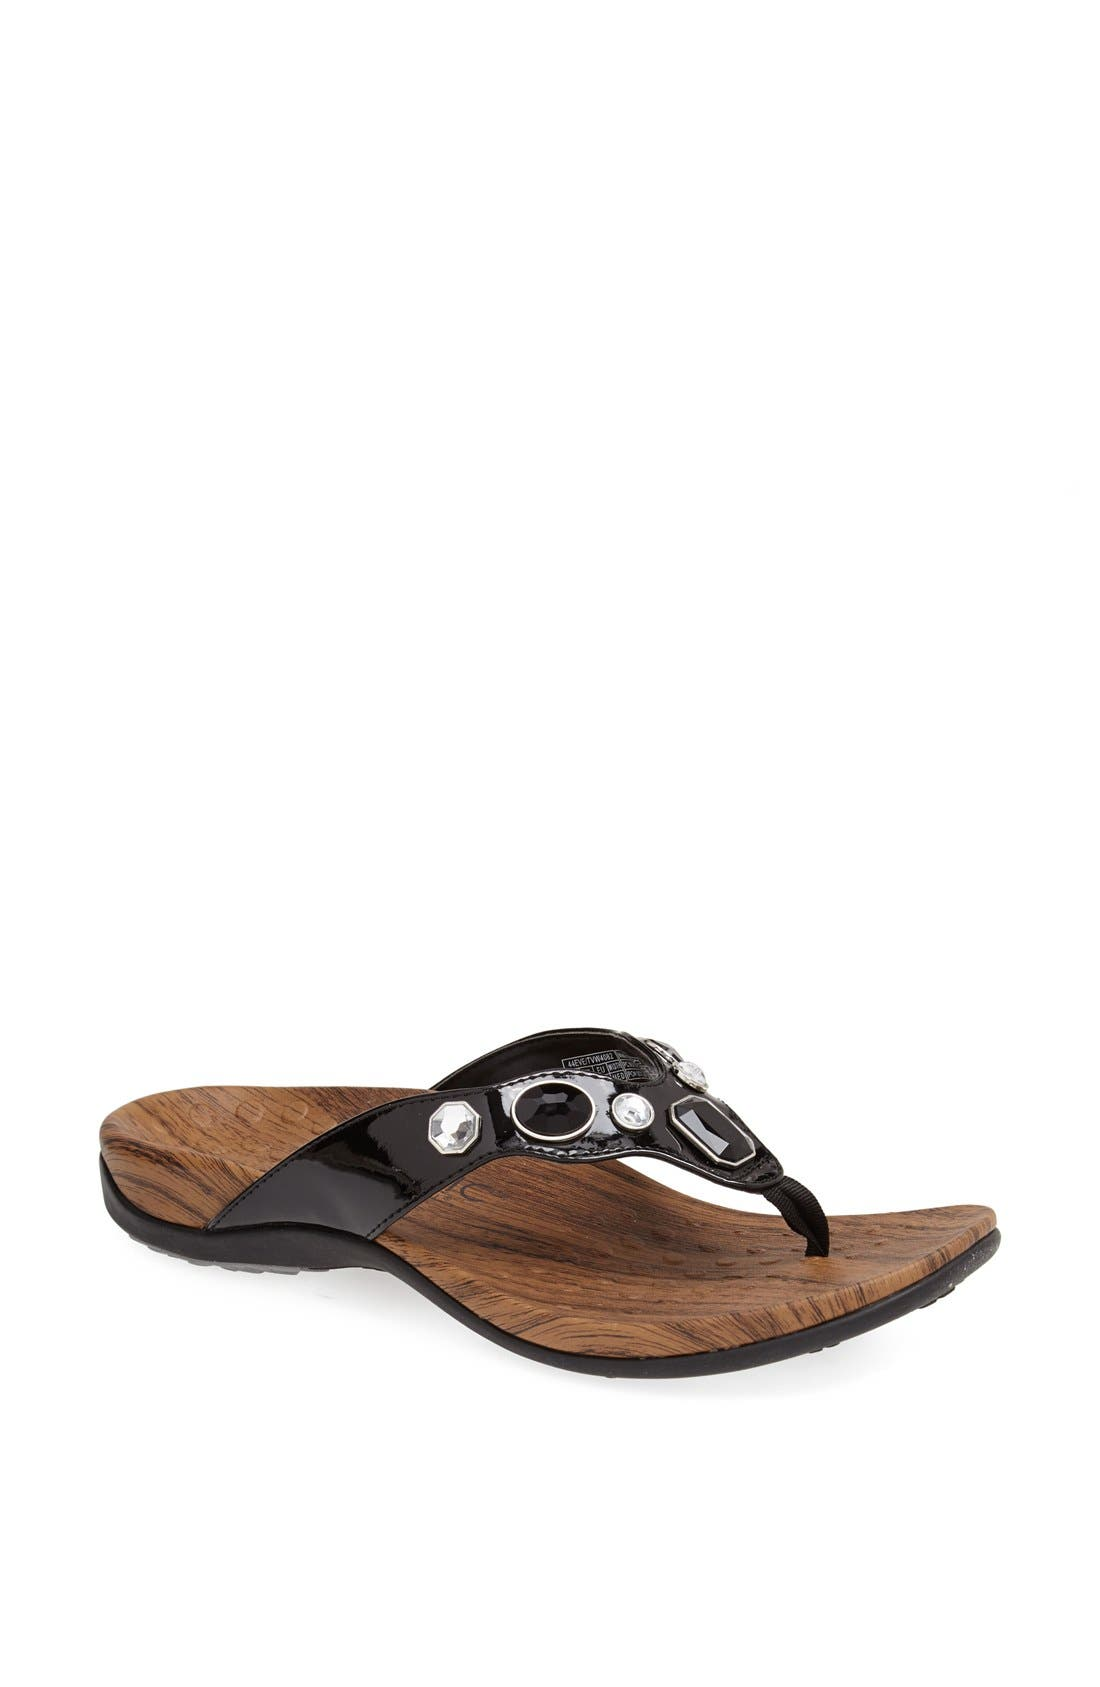 Alternate Image 1 Selected - Vionic 'Eve' Toe Post Sandal